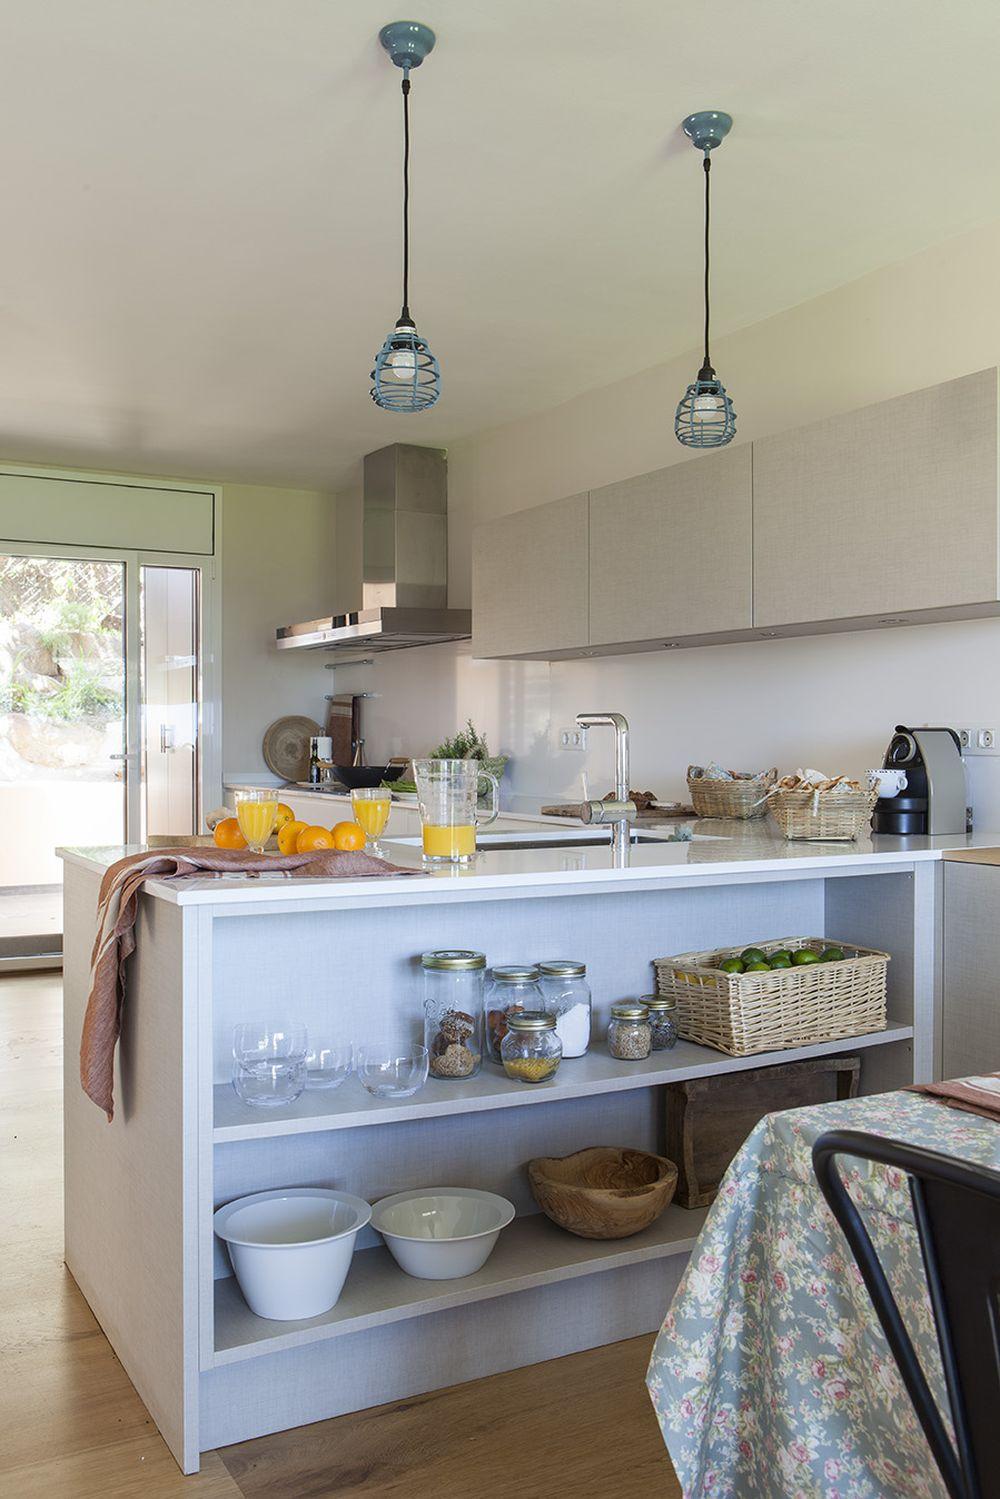 adelaparvu.com despre casa cu gradina, accente marine, designer Jeanette Dresing, Foto Feran Freixa (14)